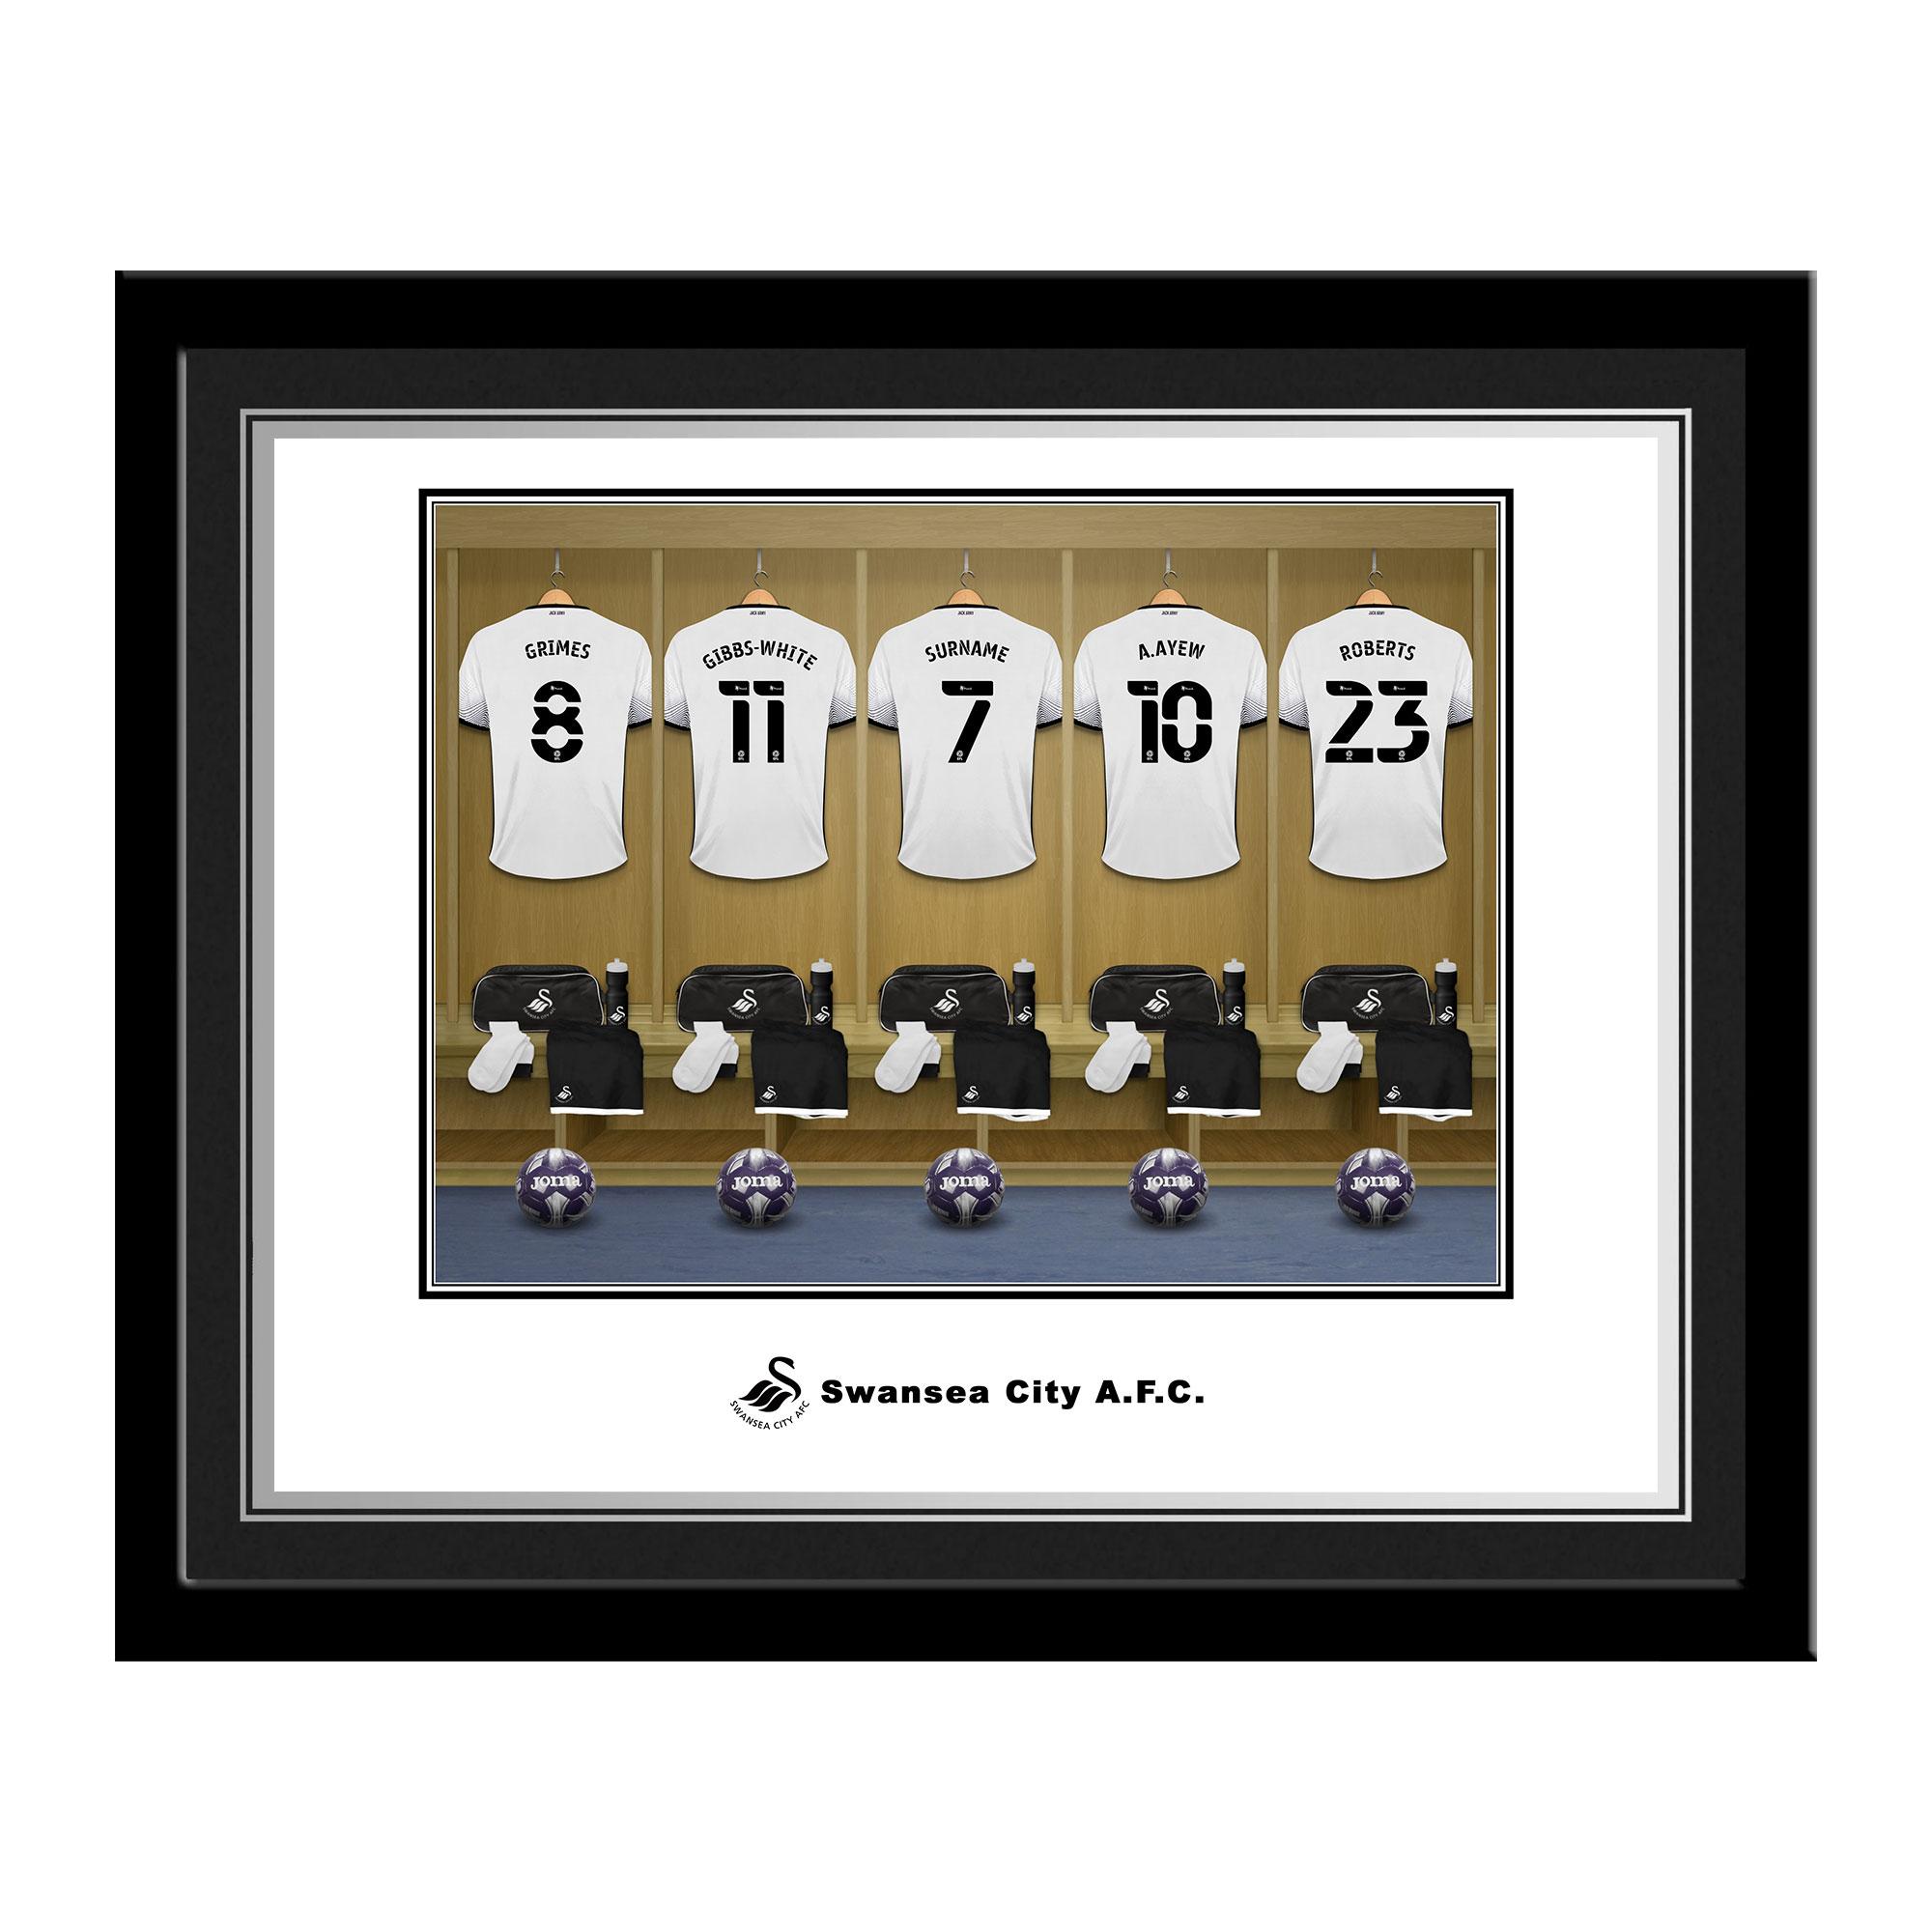 Swansea City AFC Dressing Room Photo Framed